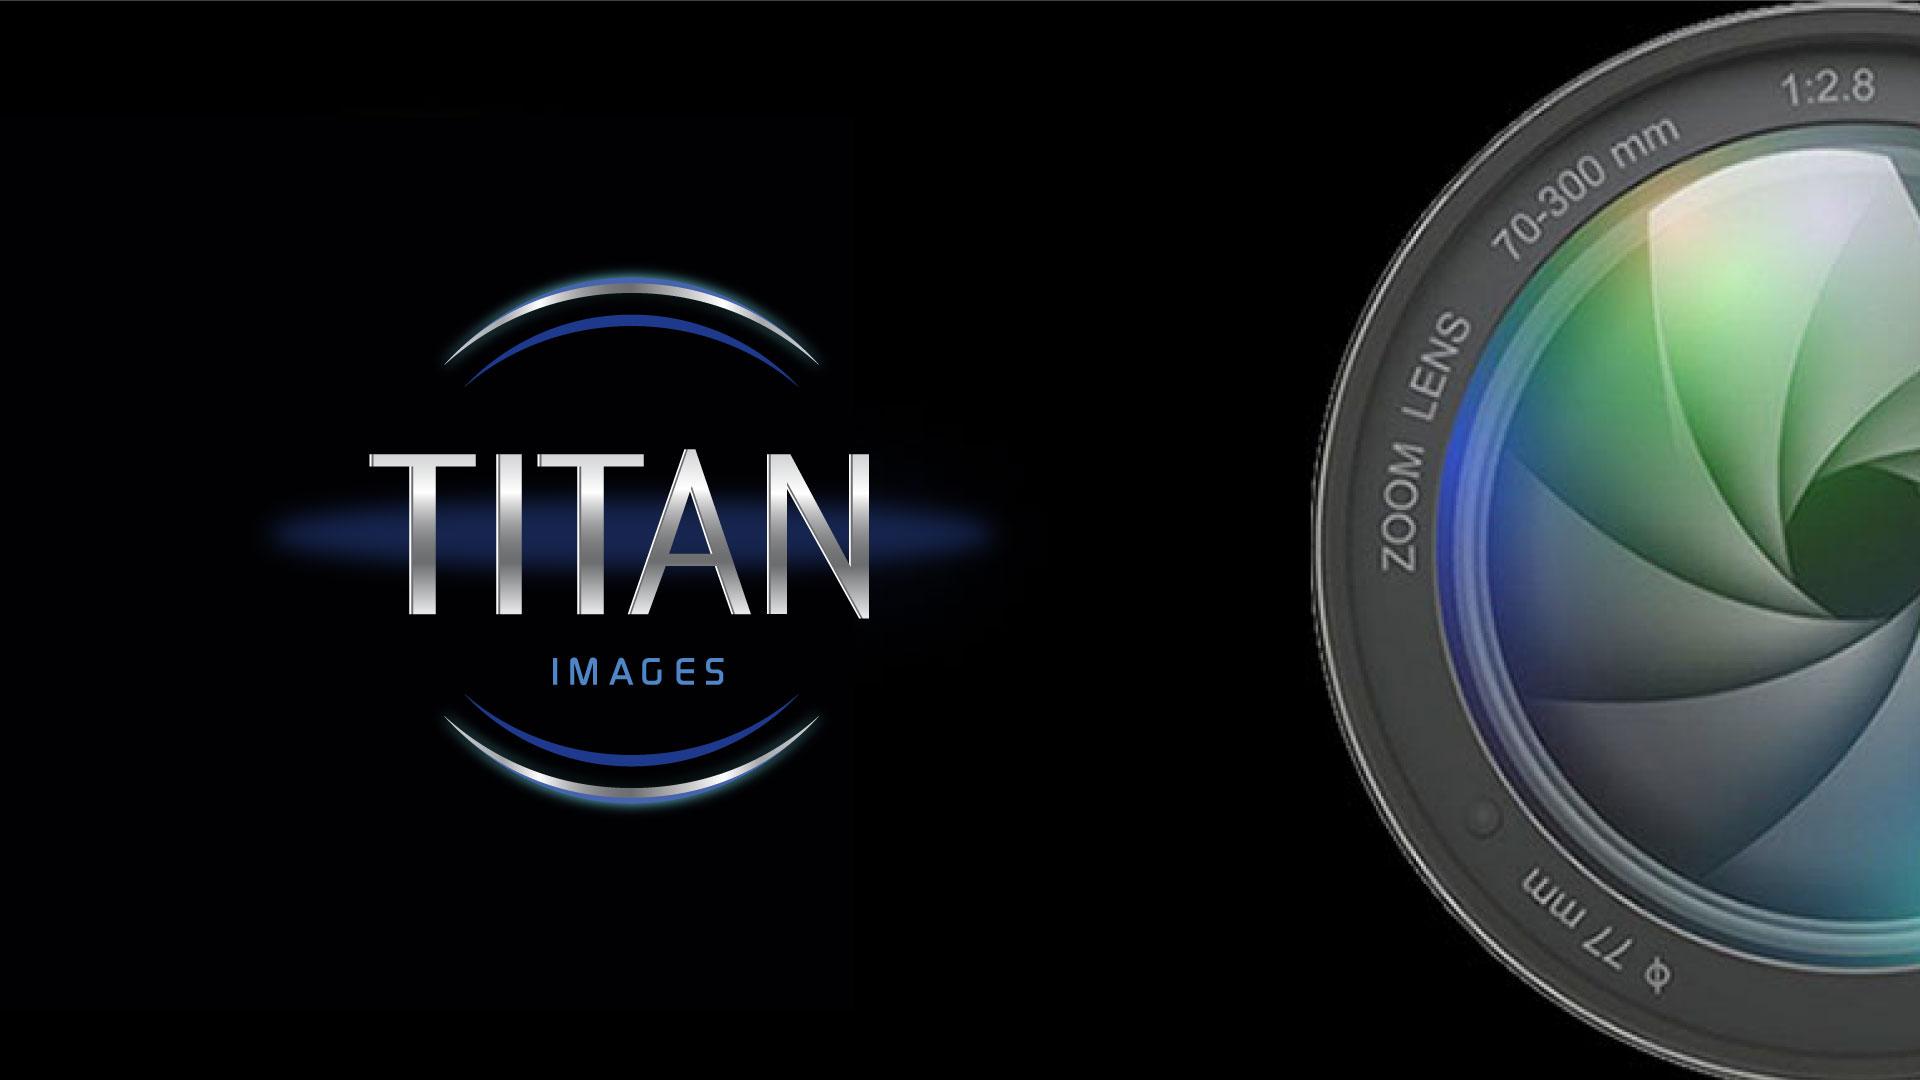 titan-brand-logo-design-by-mapleweb-vancouver-canada-camera-lens-mock